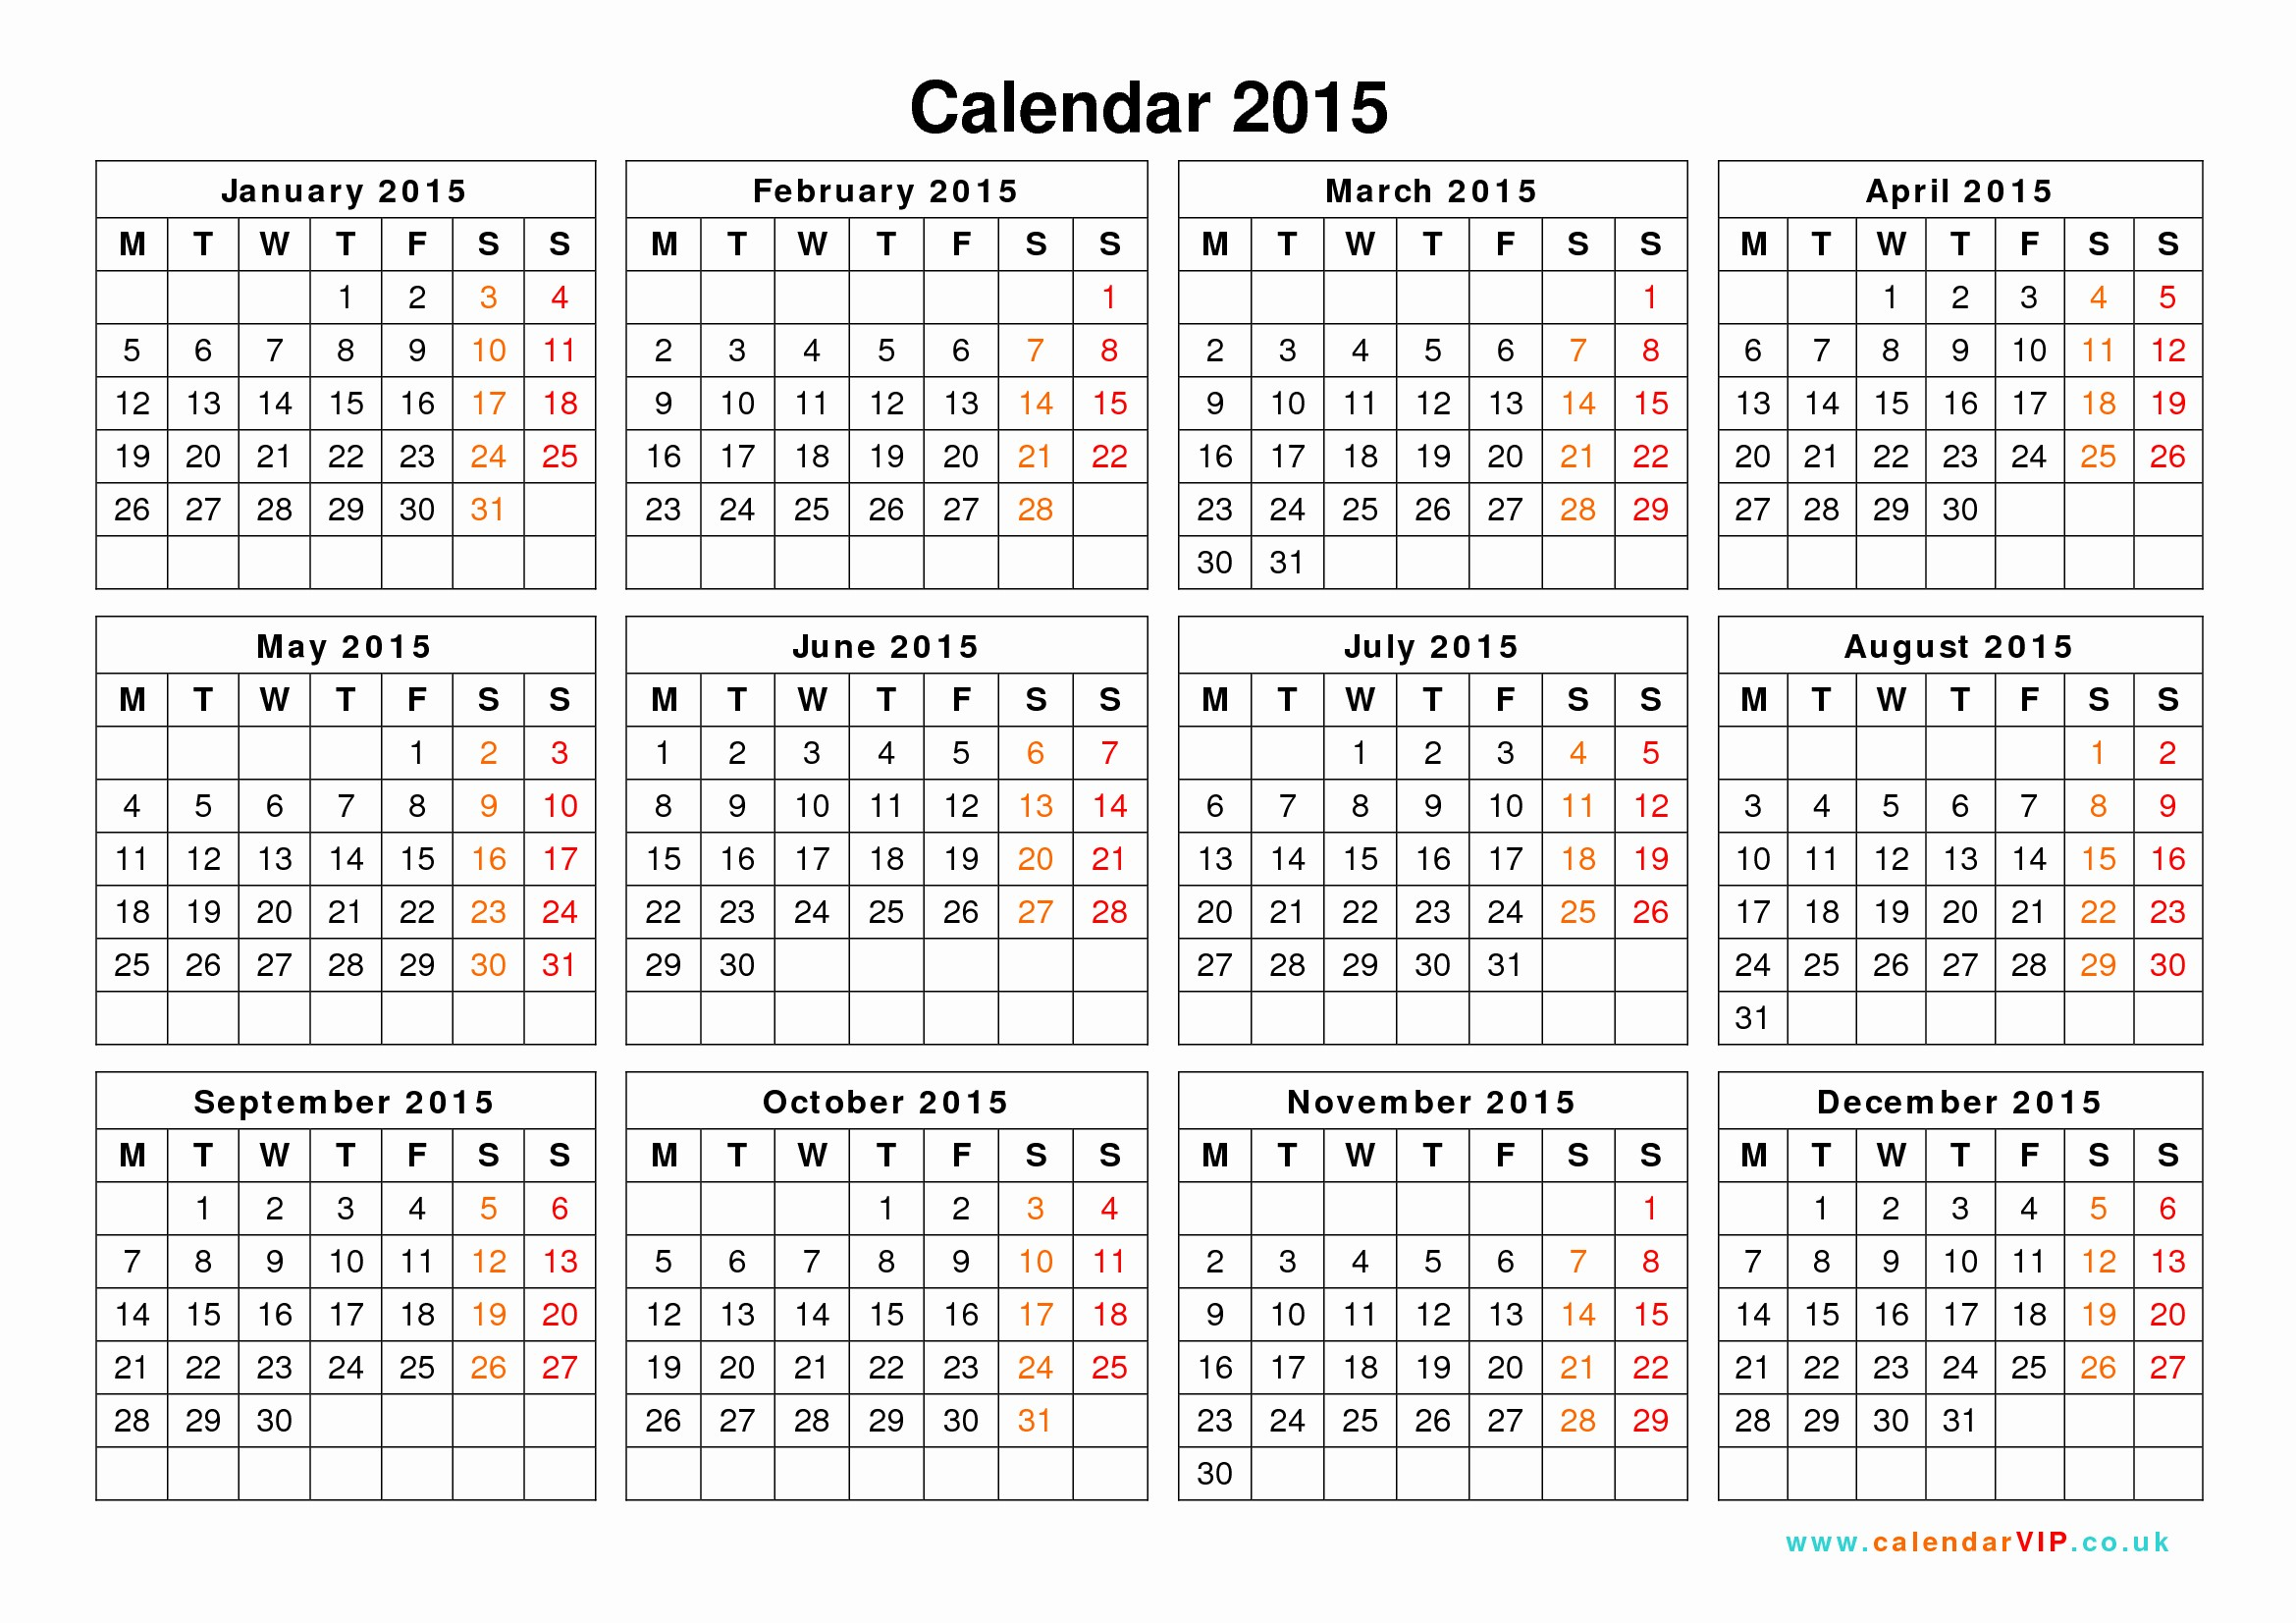 2015 Yearly Calendar Printable Landscape Beautiful Calendar 2015 Uk Free Yearly Calendar Templates for Uk